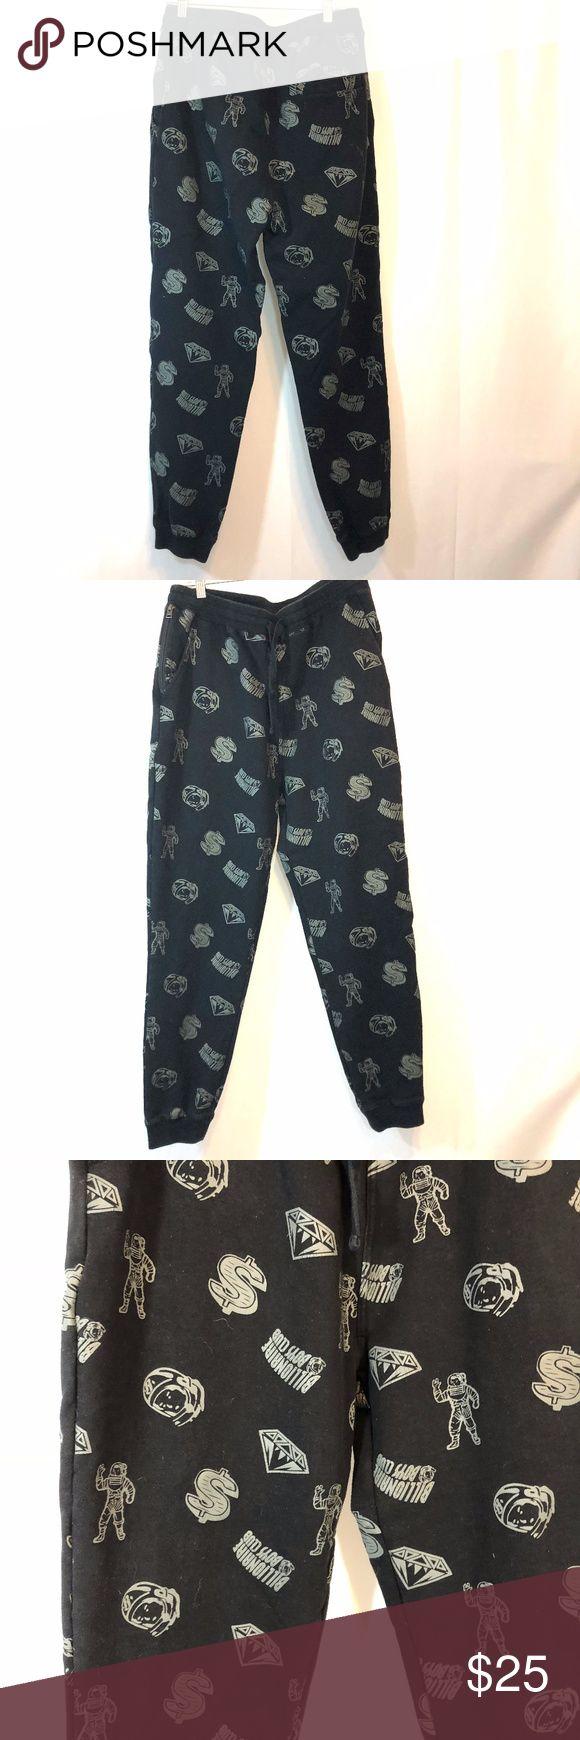 Billionaire Boys Club Sweat Pants Black cotton diamonds and dollars print coverage sweat pants. Billionaire Boys Club Pants Sweatpants & Joggers